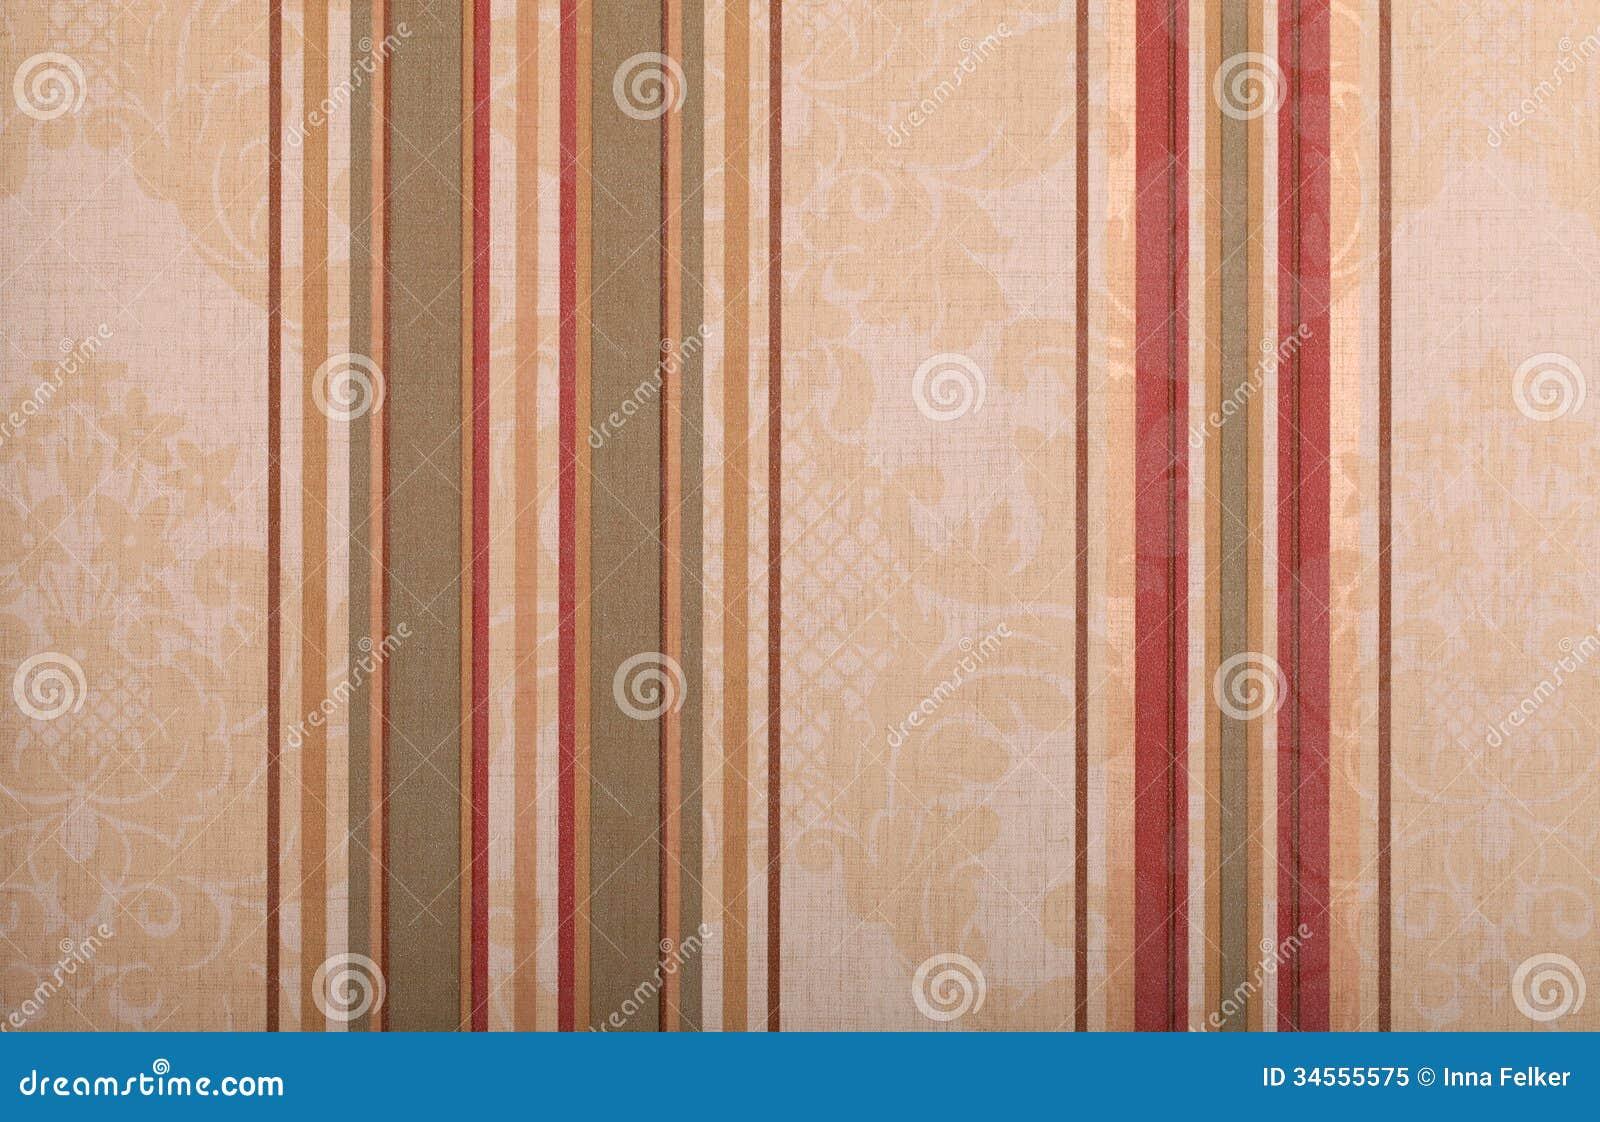 Striped beige vintage wallpaper background royalty free - Papel pared vintage ...